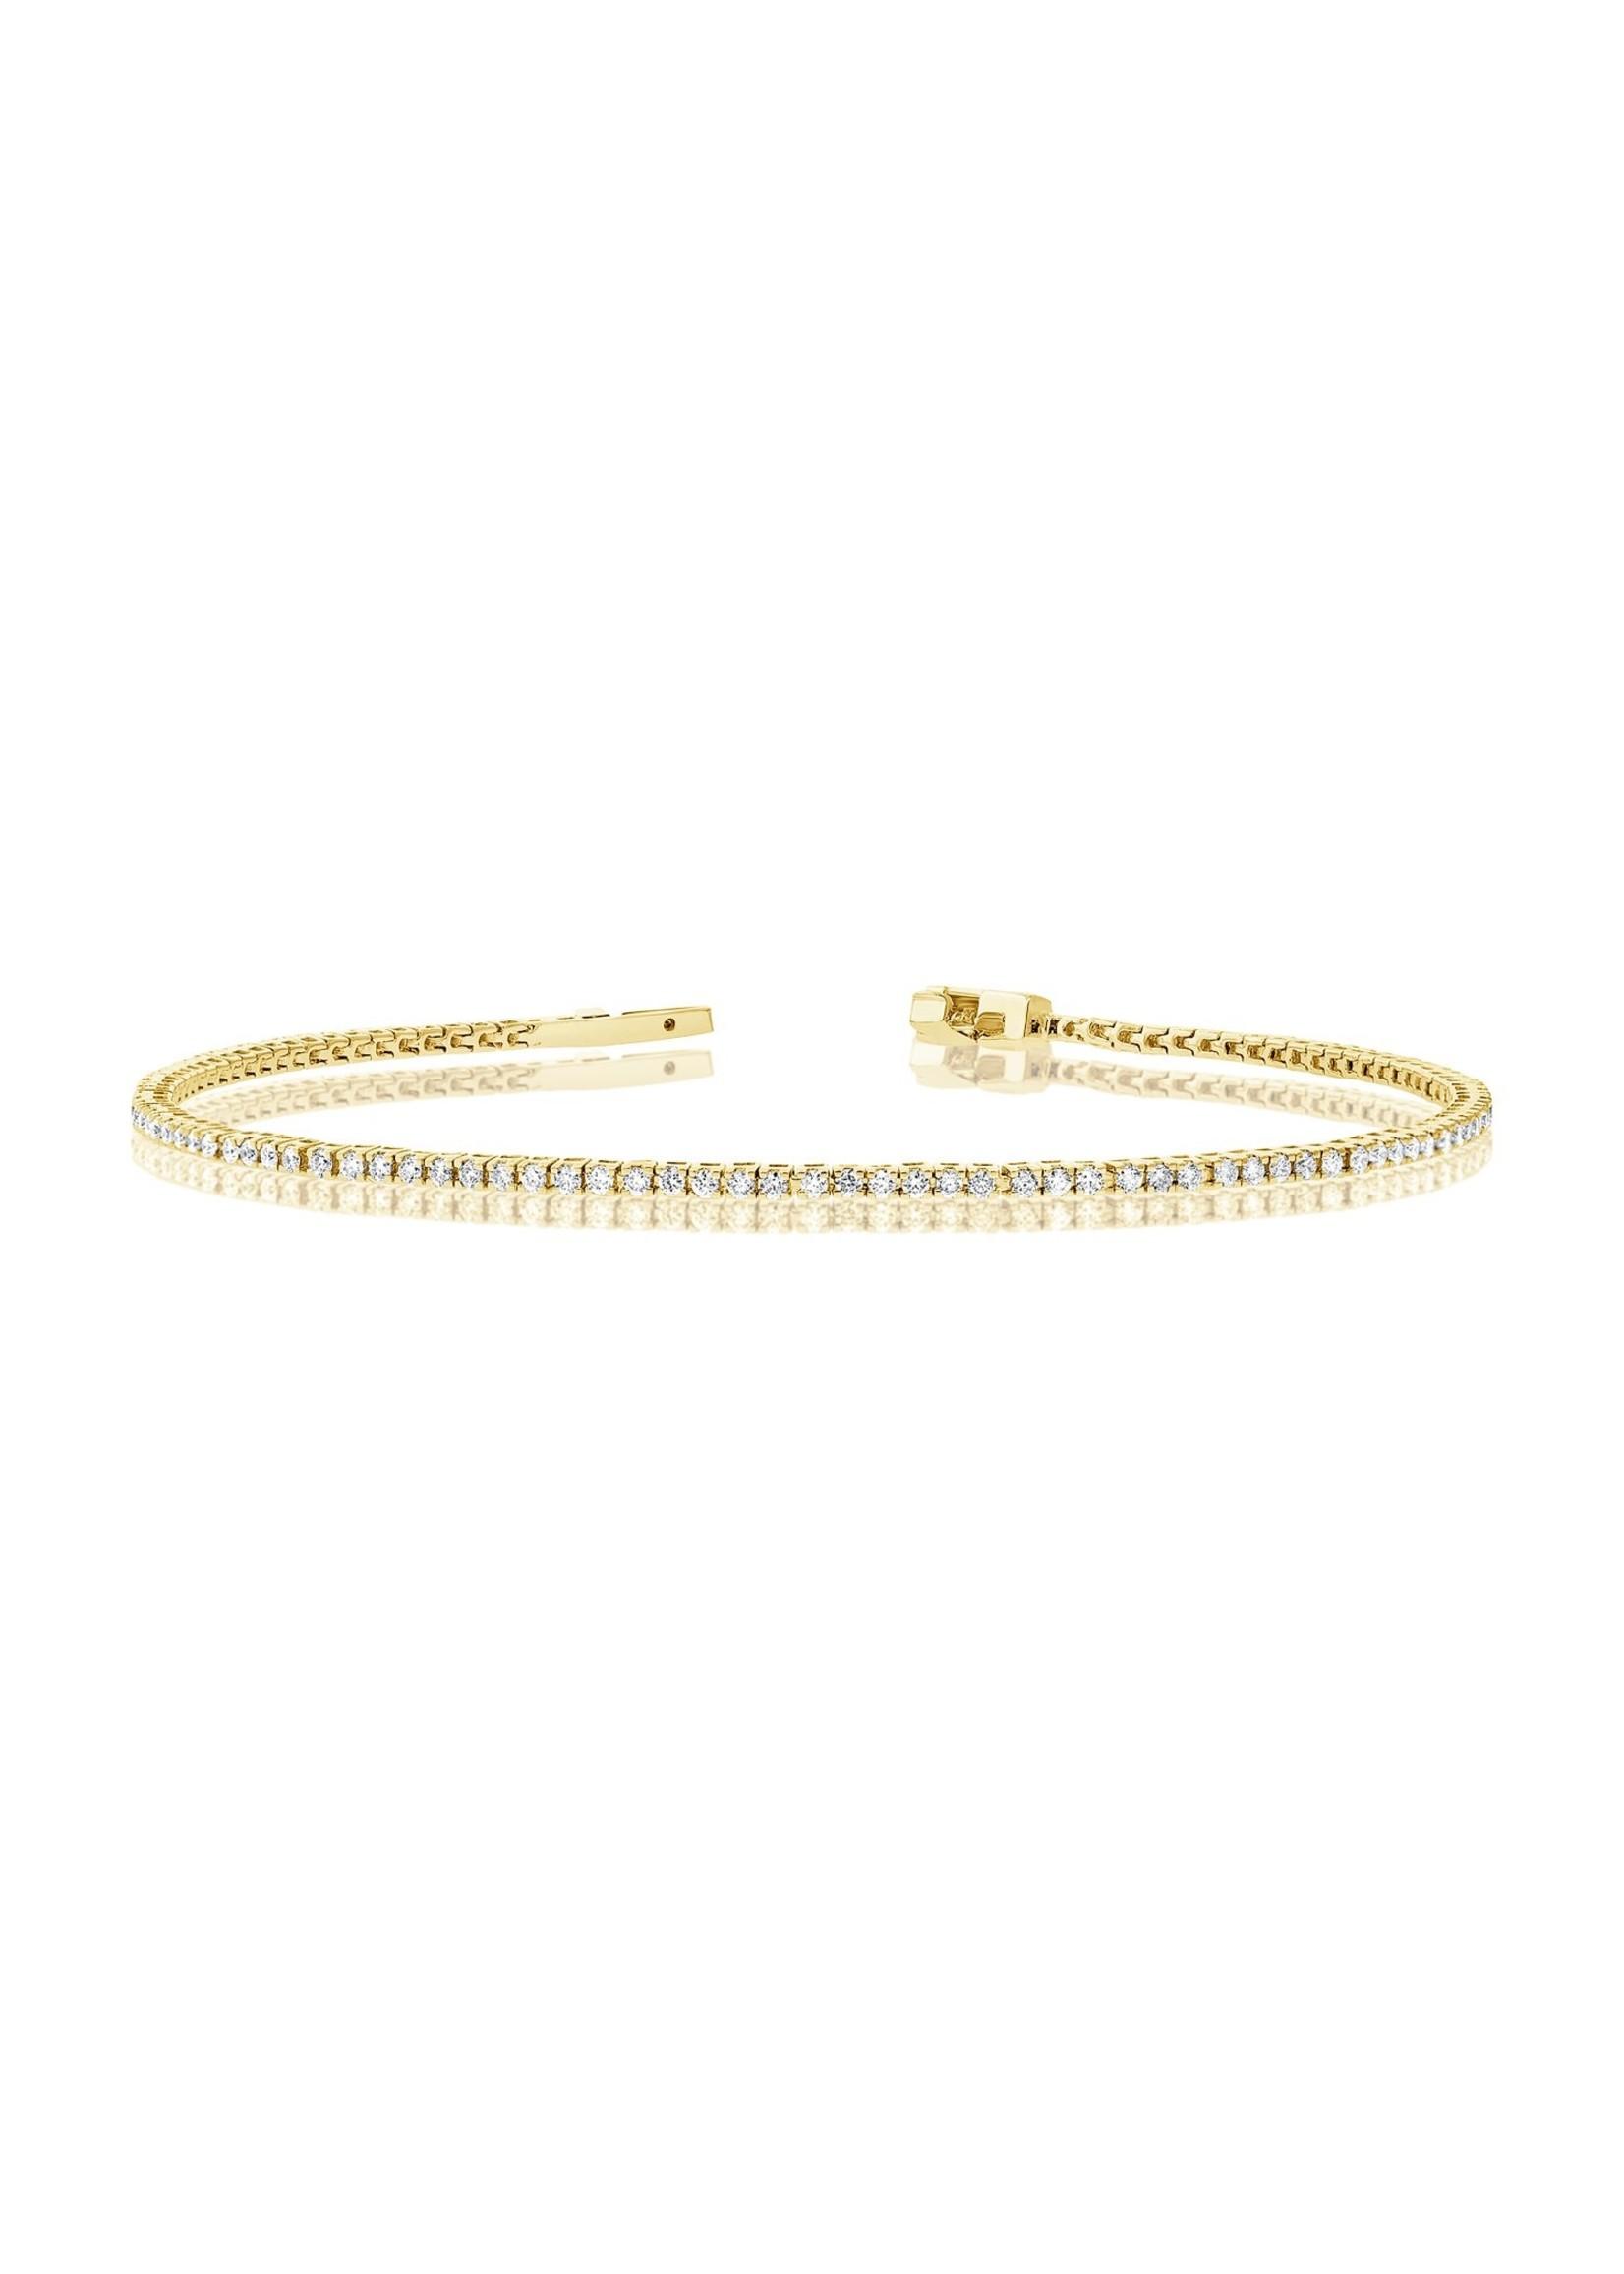 Jill Alberts Diamond Baby Tennis Bracelet